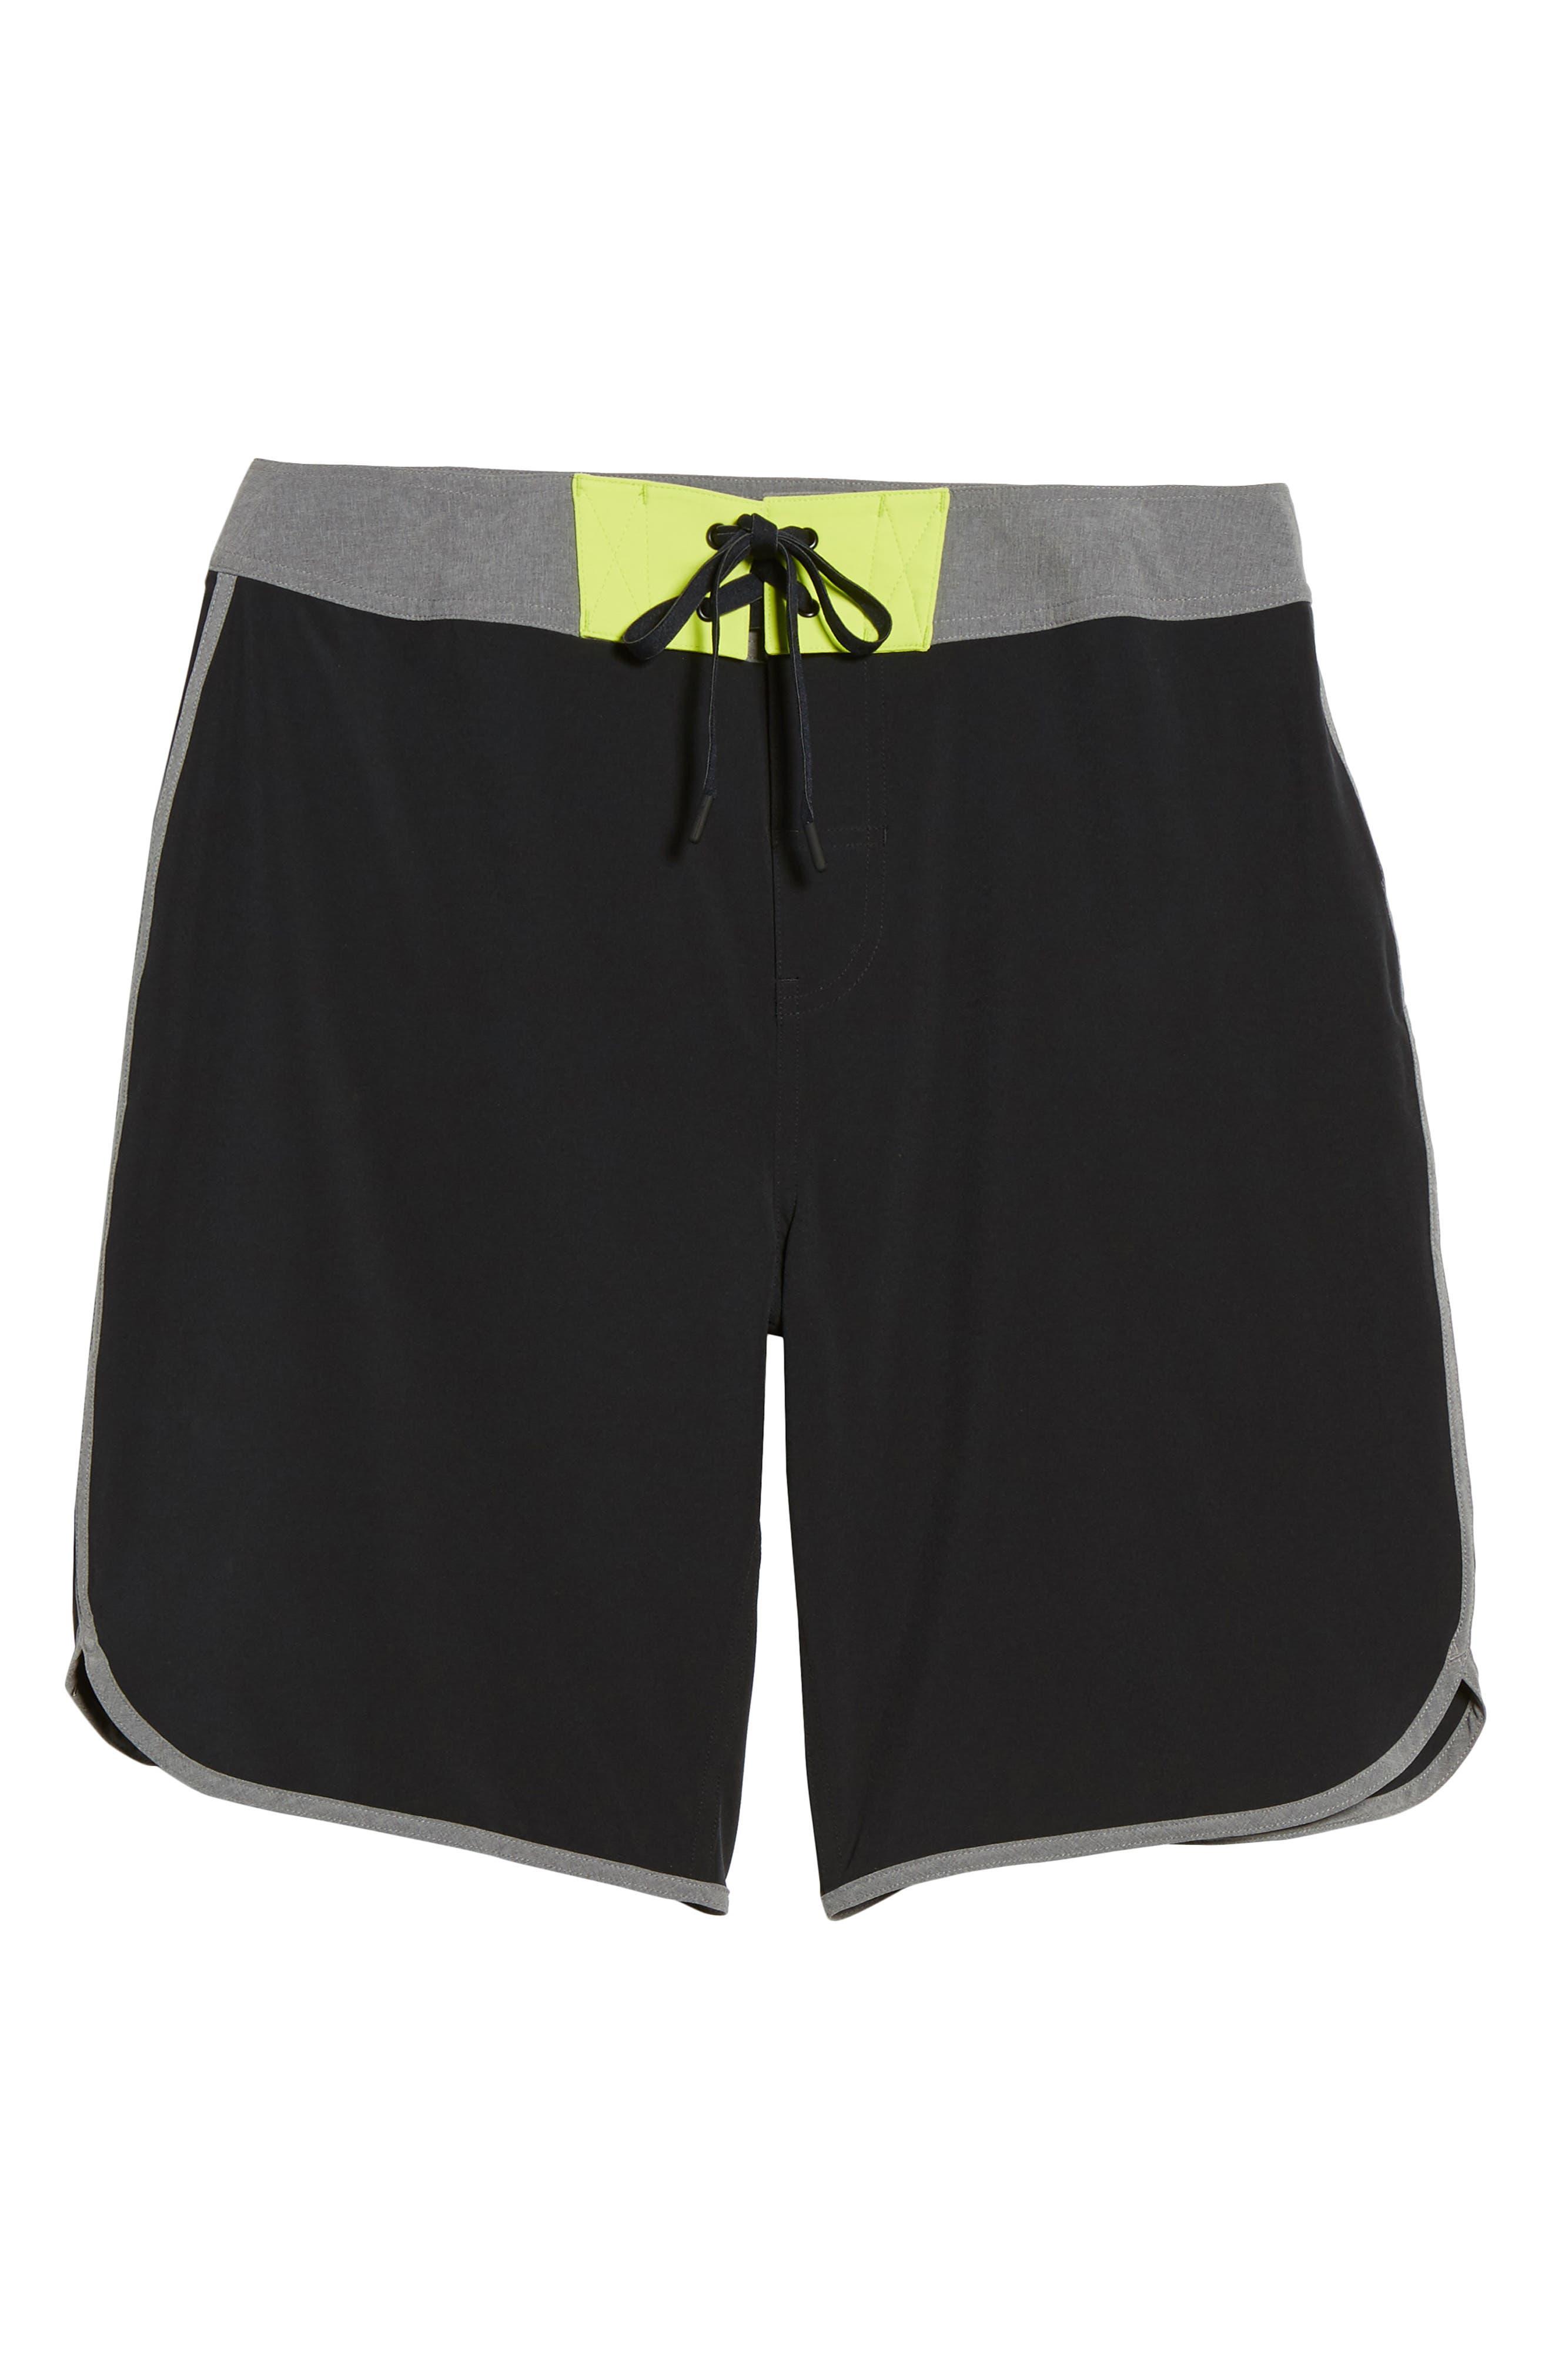 Flex Hybrid Athletic Shorts,                             Alternate thumbnail 6, color,                             Black